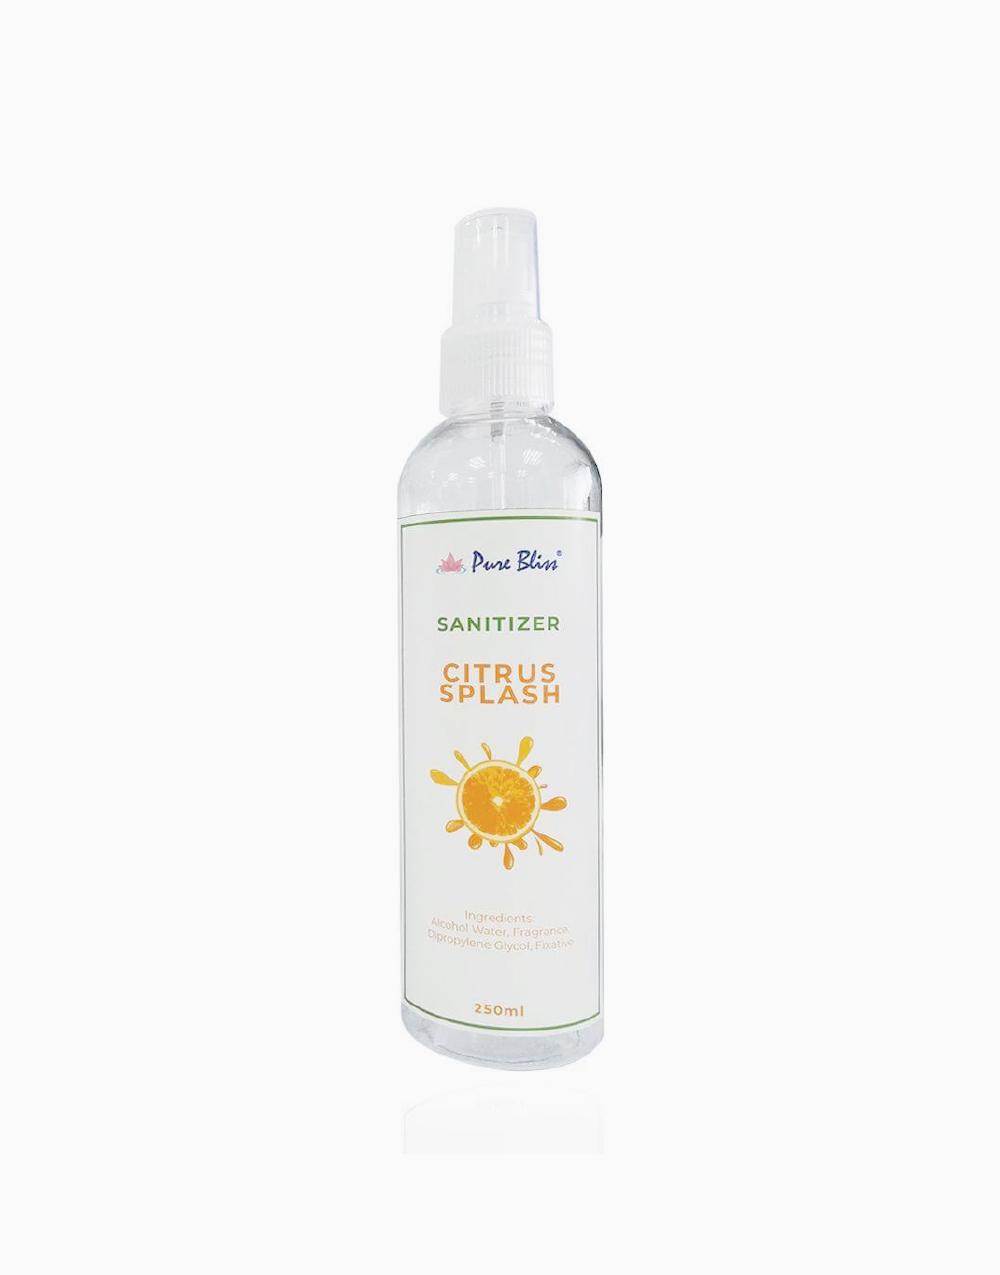 Sanitizer (250ml) by Pure Bliss   Citrus Splash